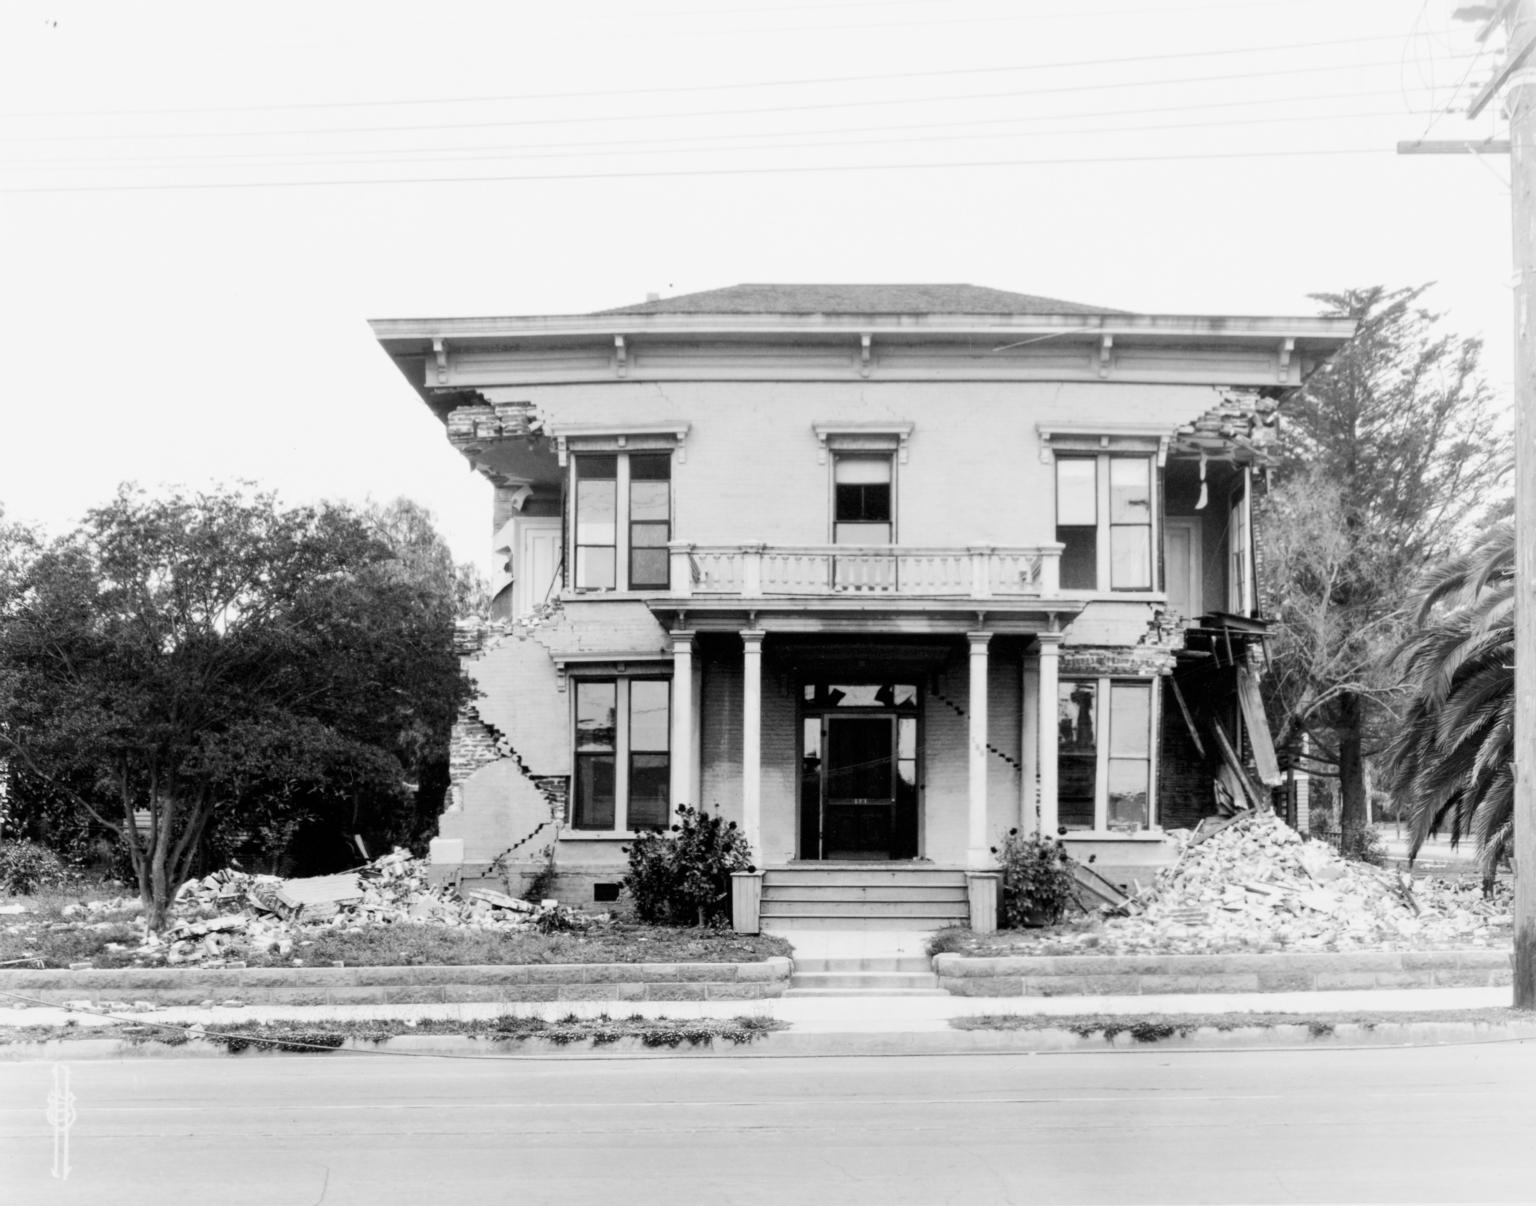 Santa Barbara 1925 Earthquake Damage - Residence